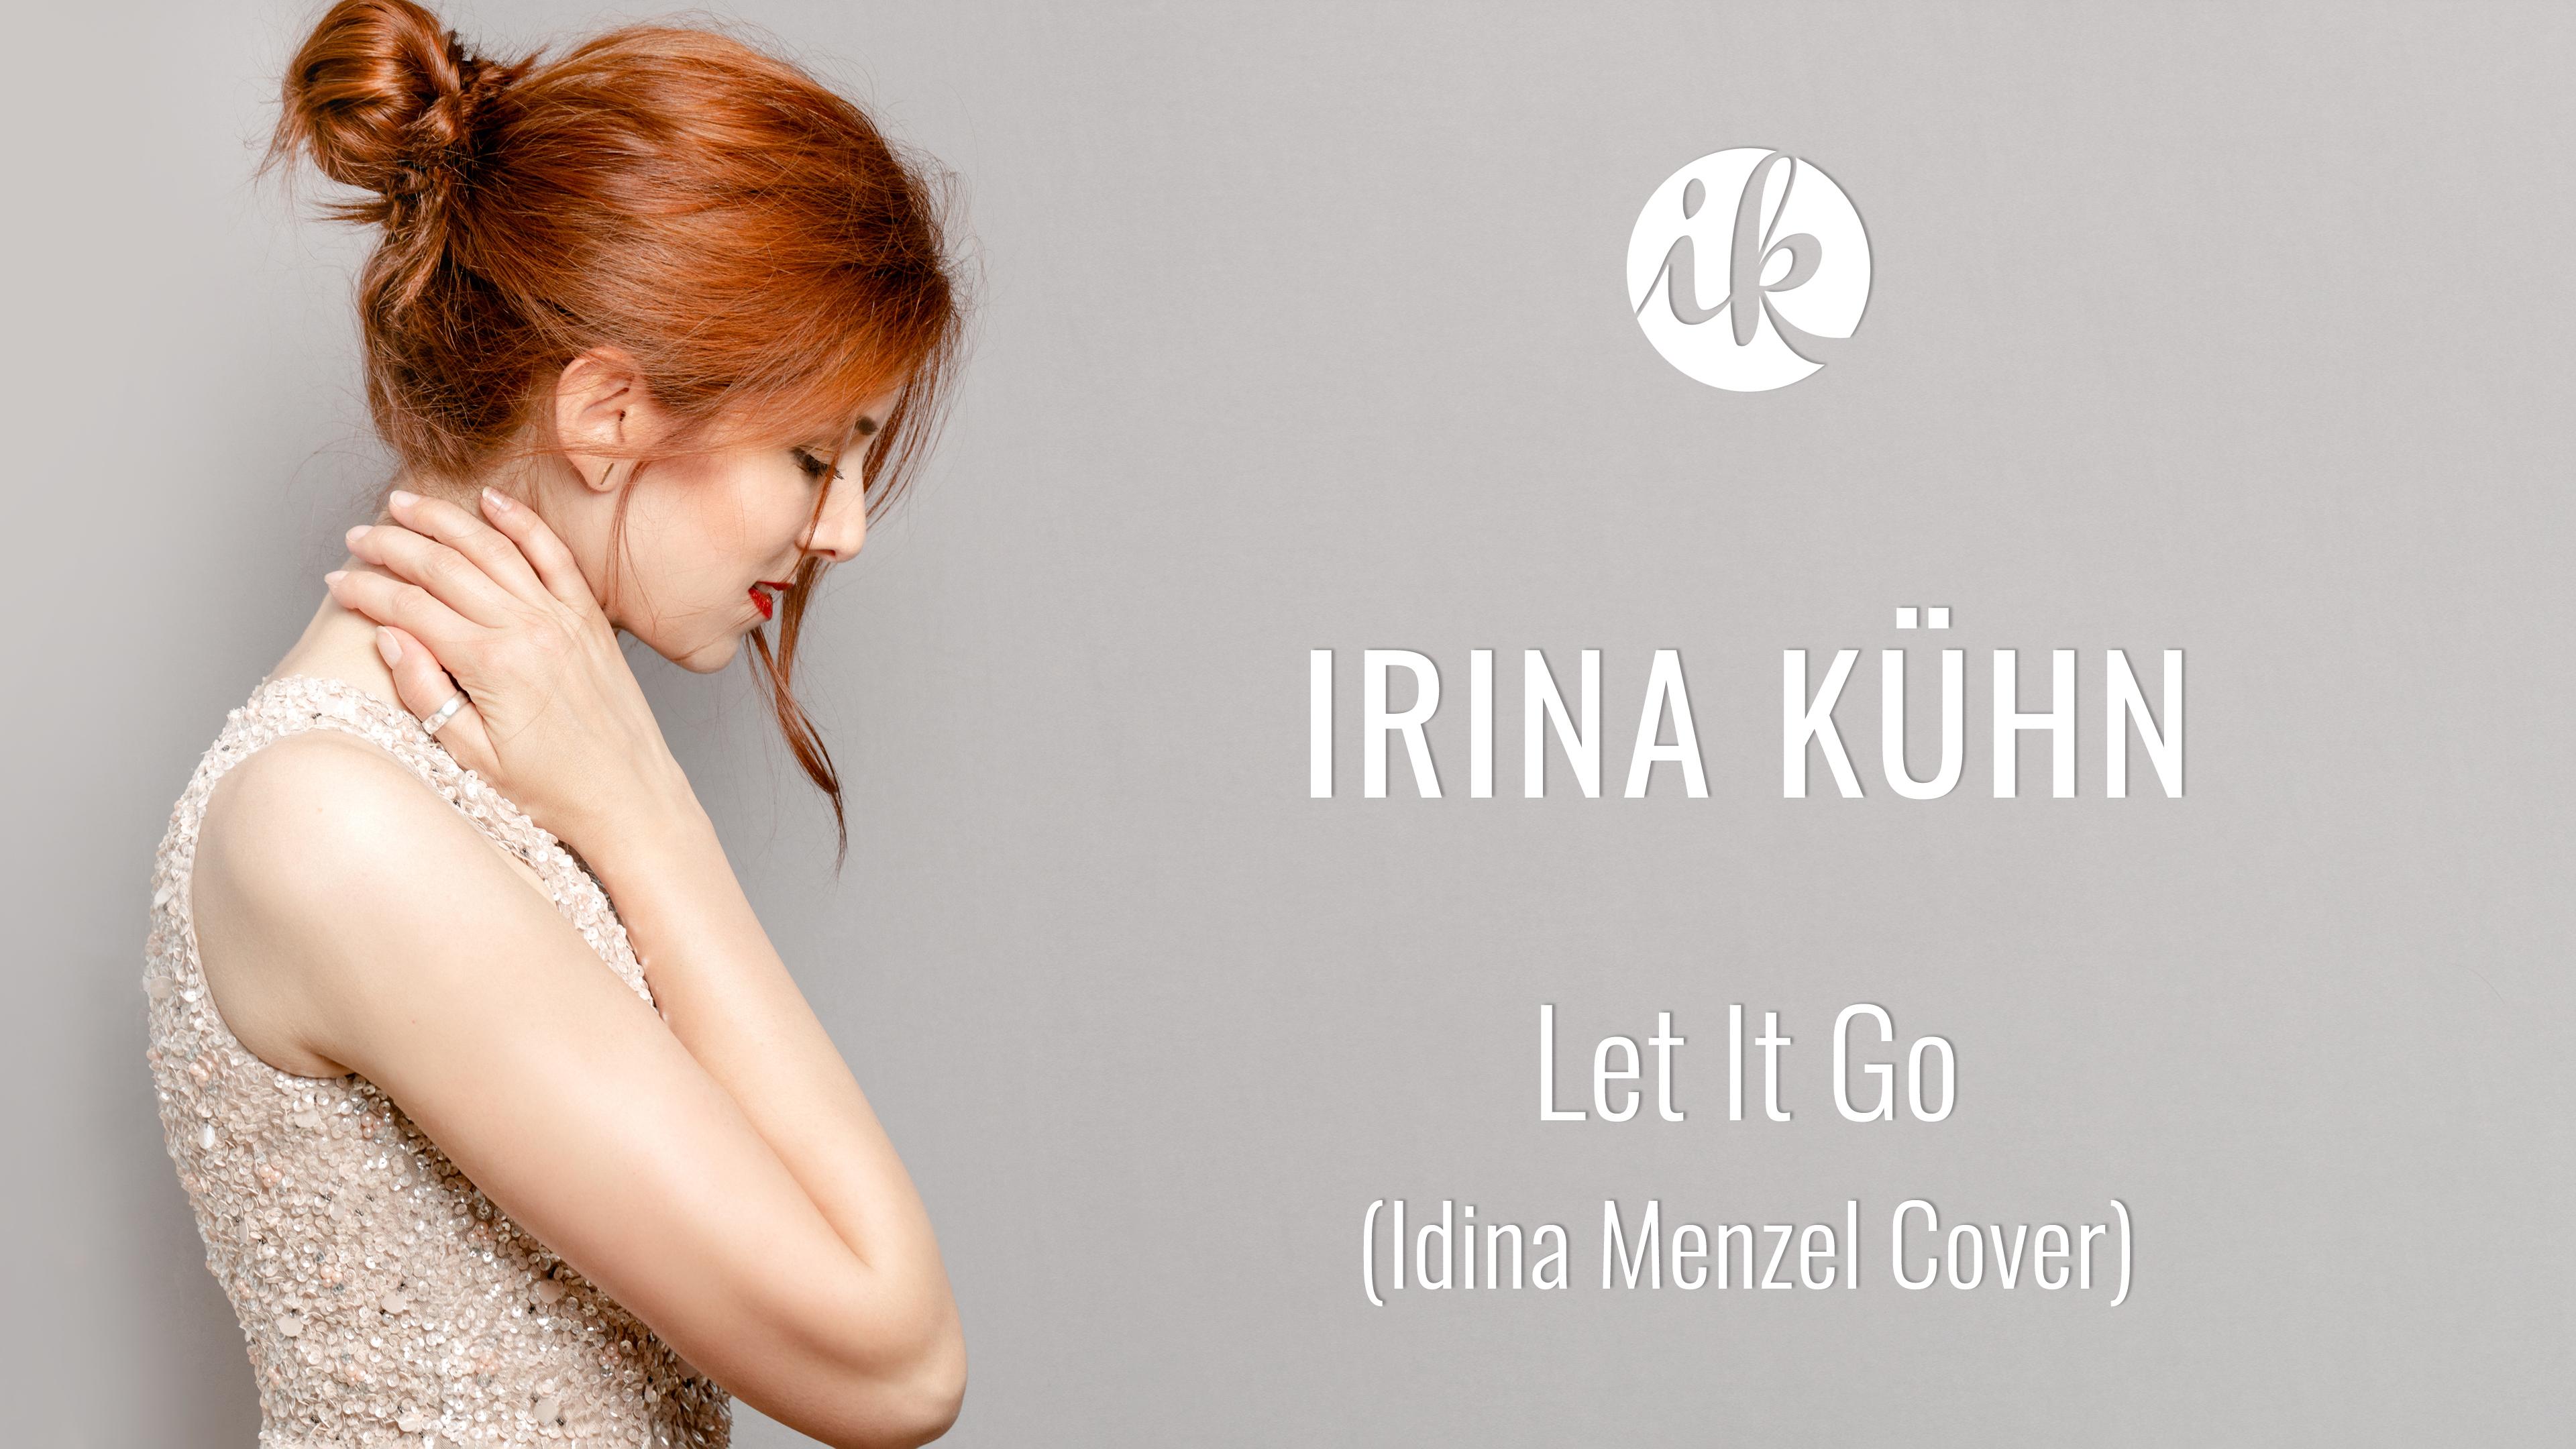 Irina Kühn singt Let It Go